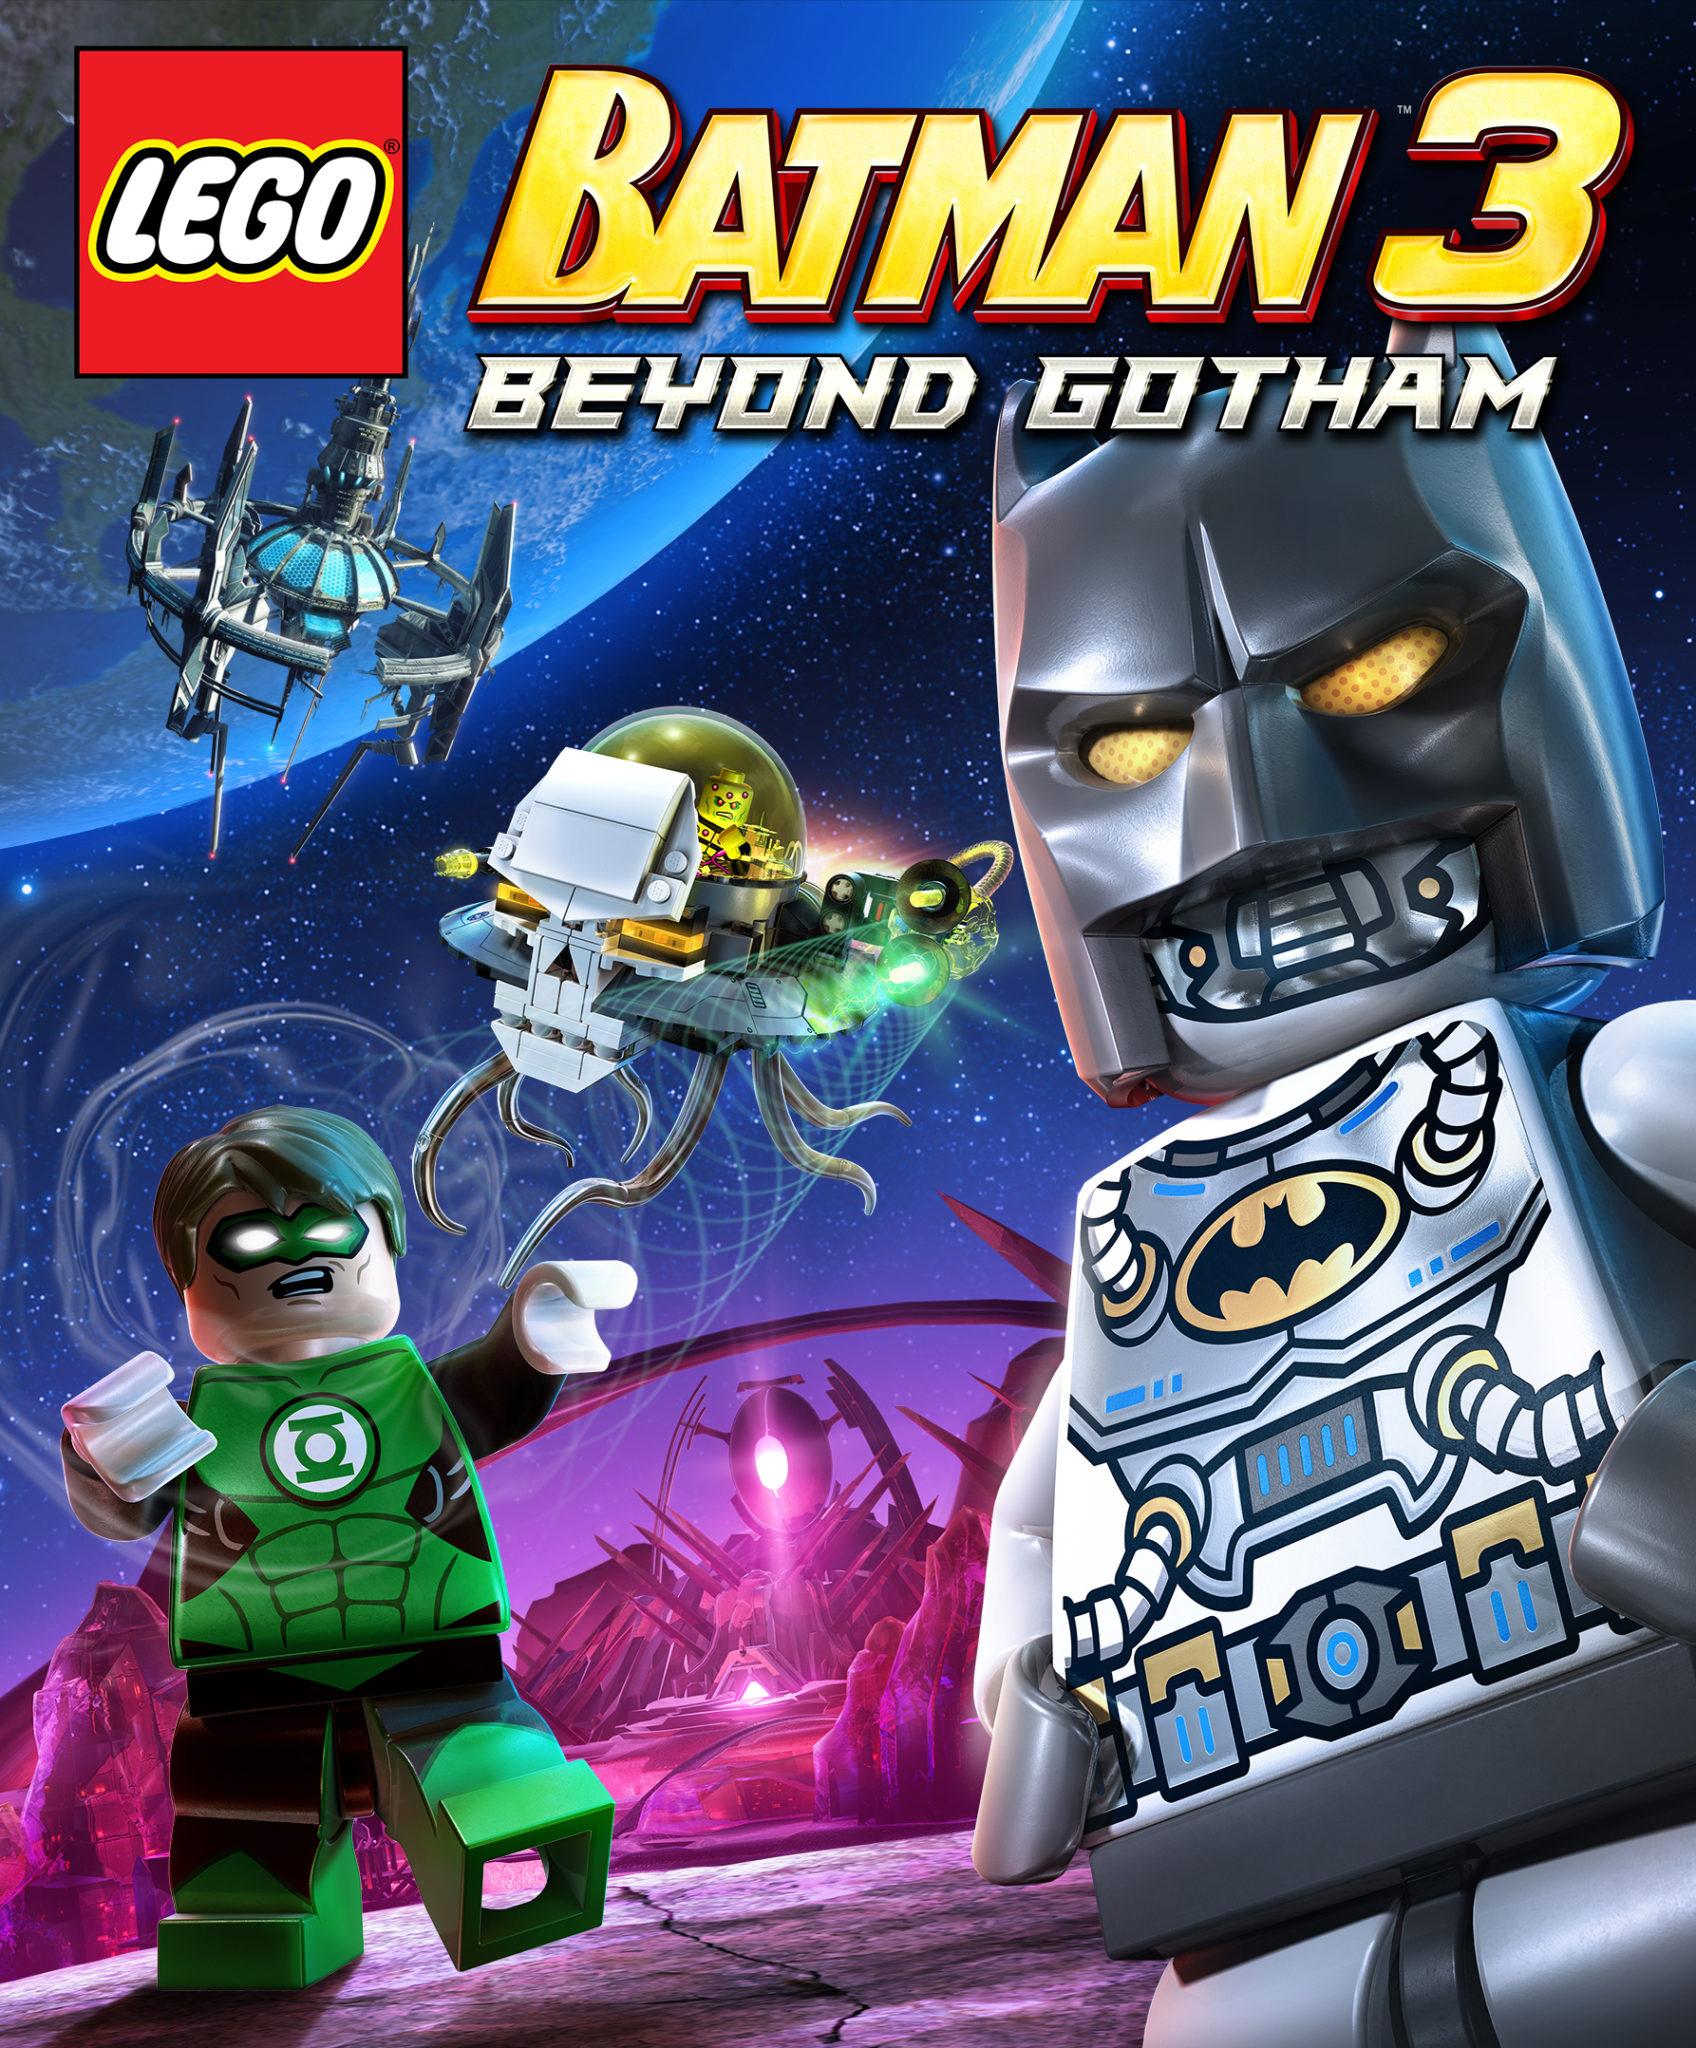 LEGO Batman 3 Beyond Gotham – PS3